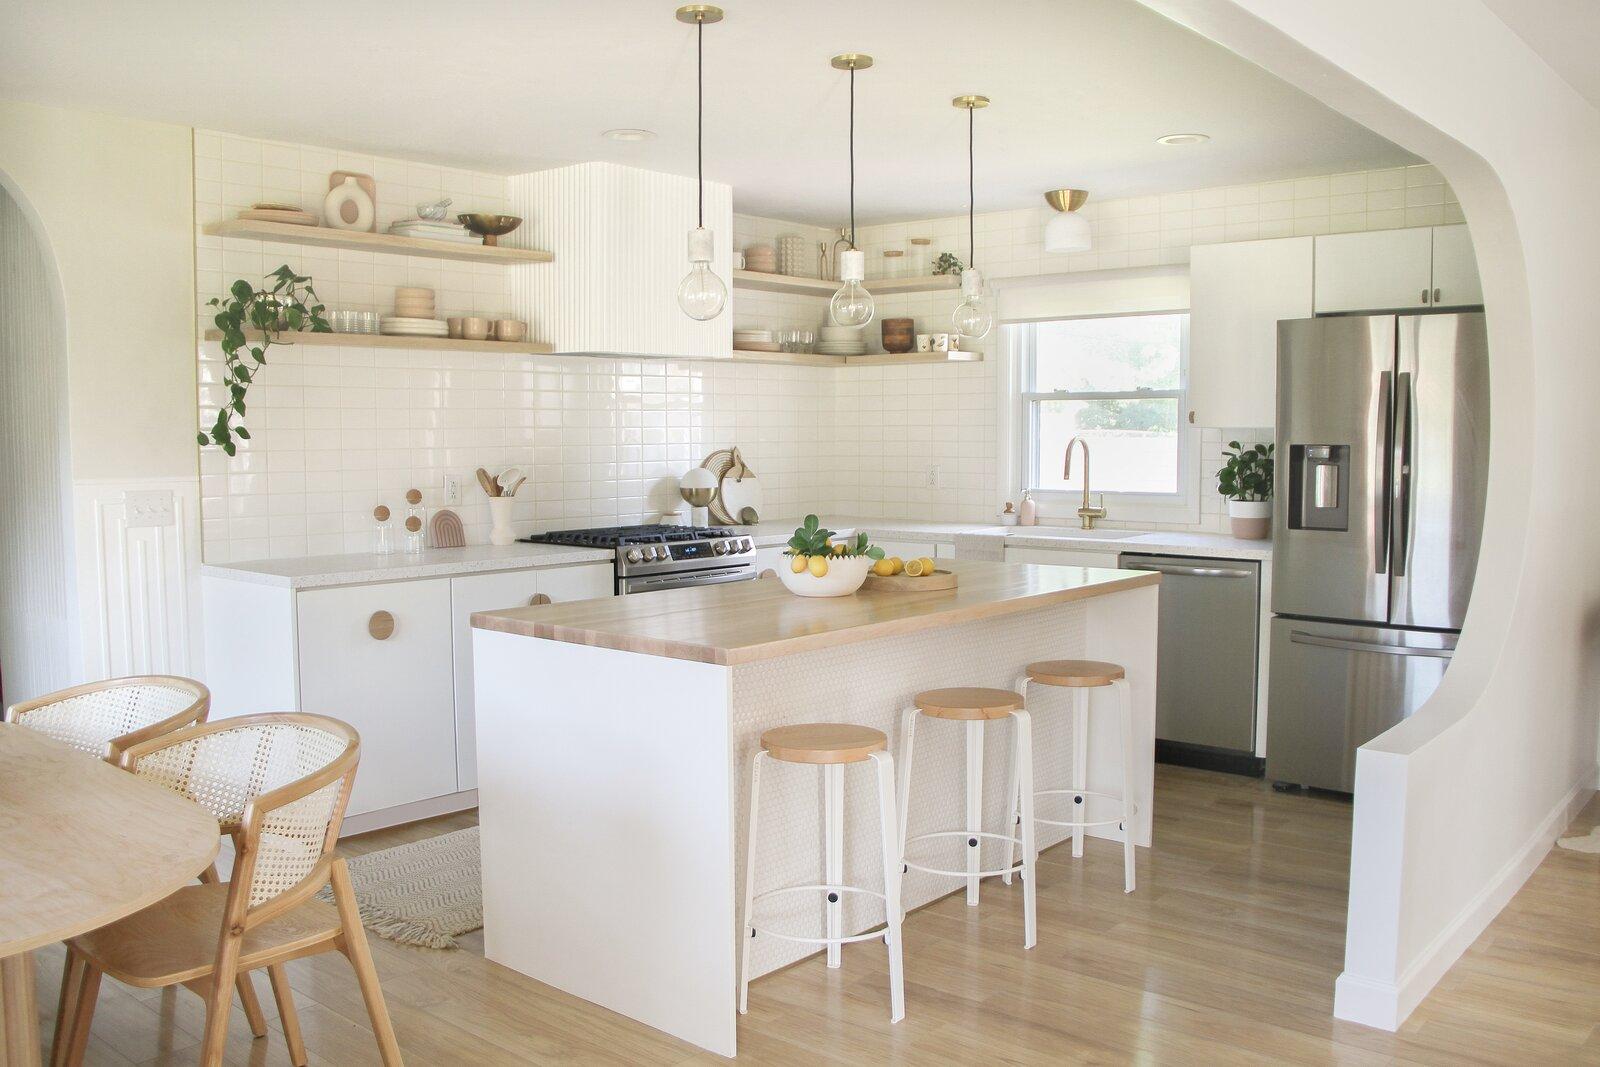 britdotdesign Kitchen Reno by britdotdesign